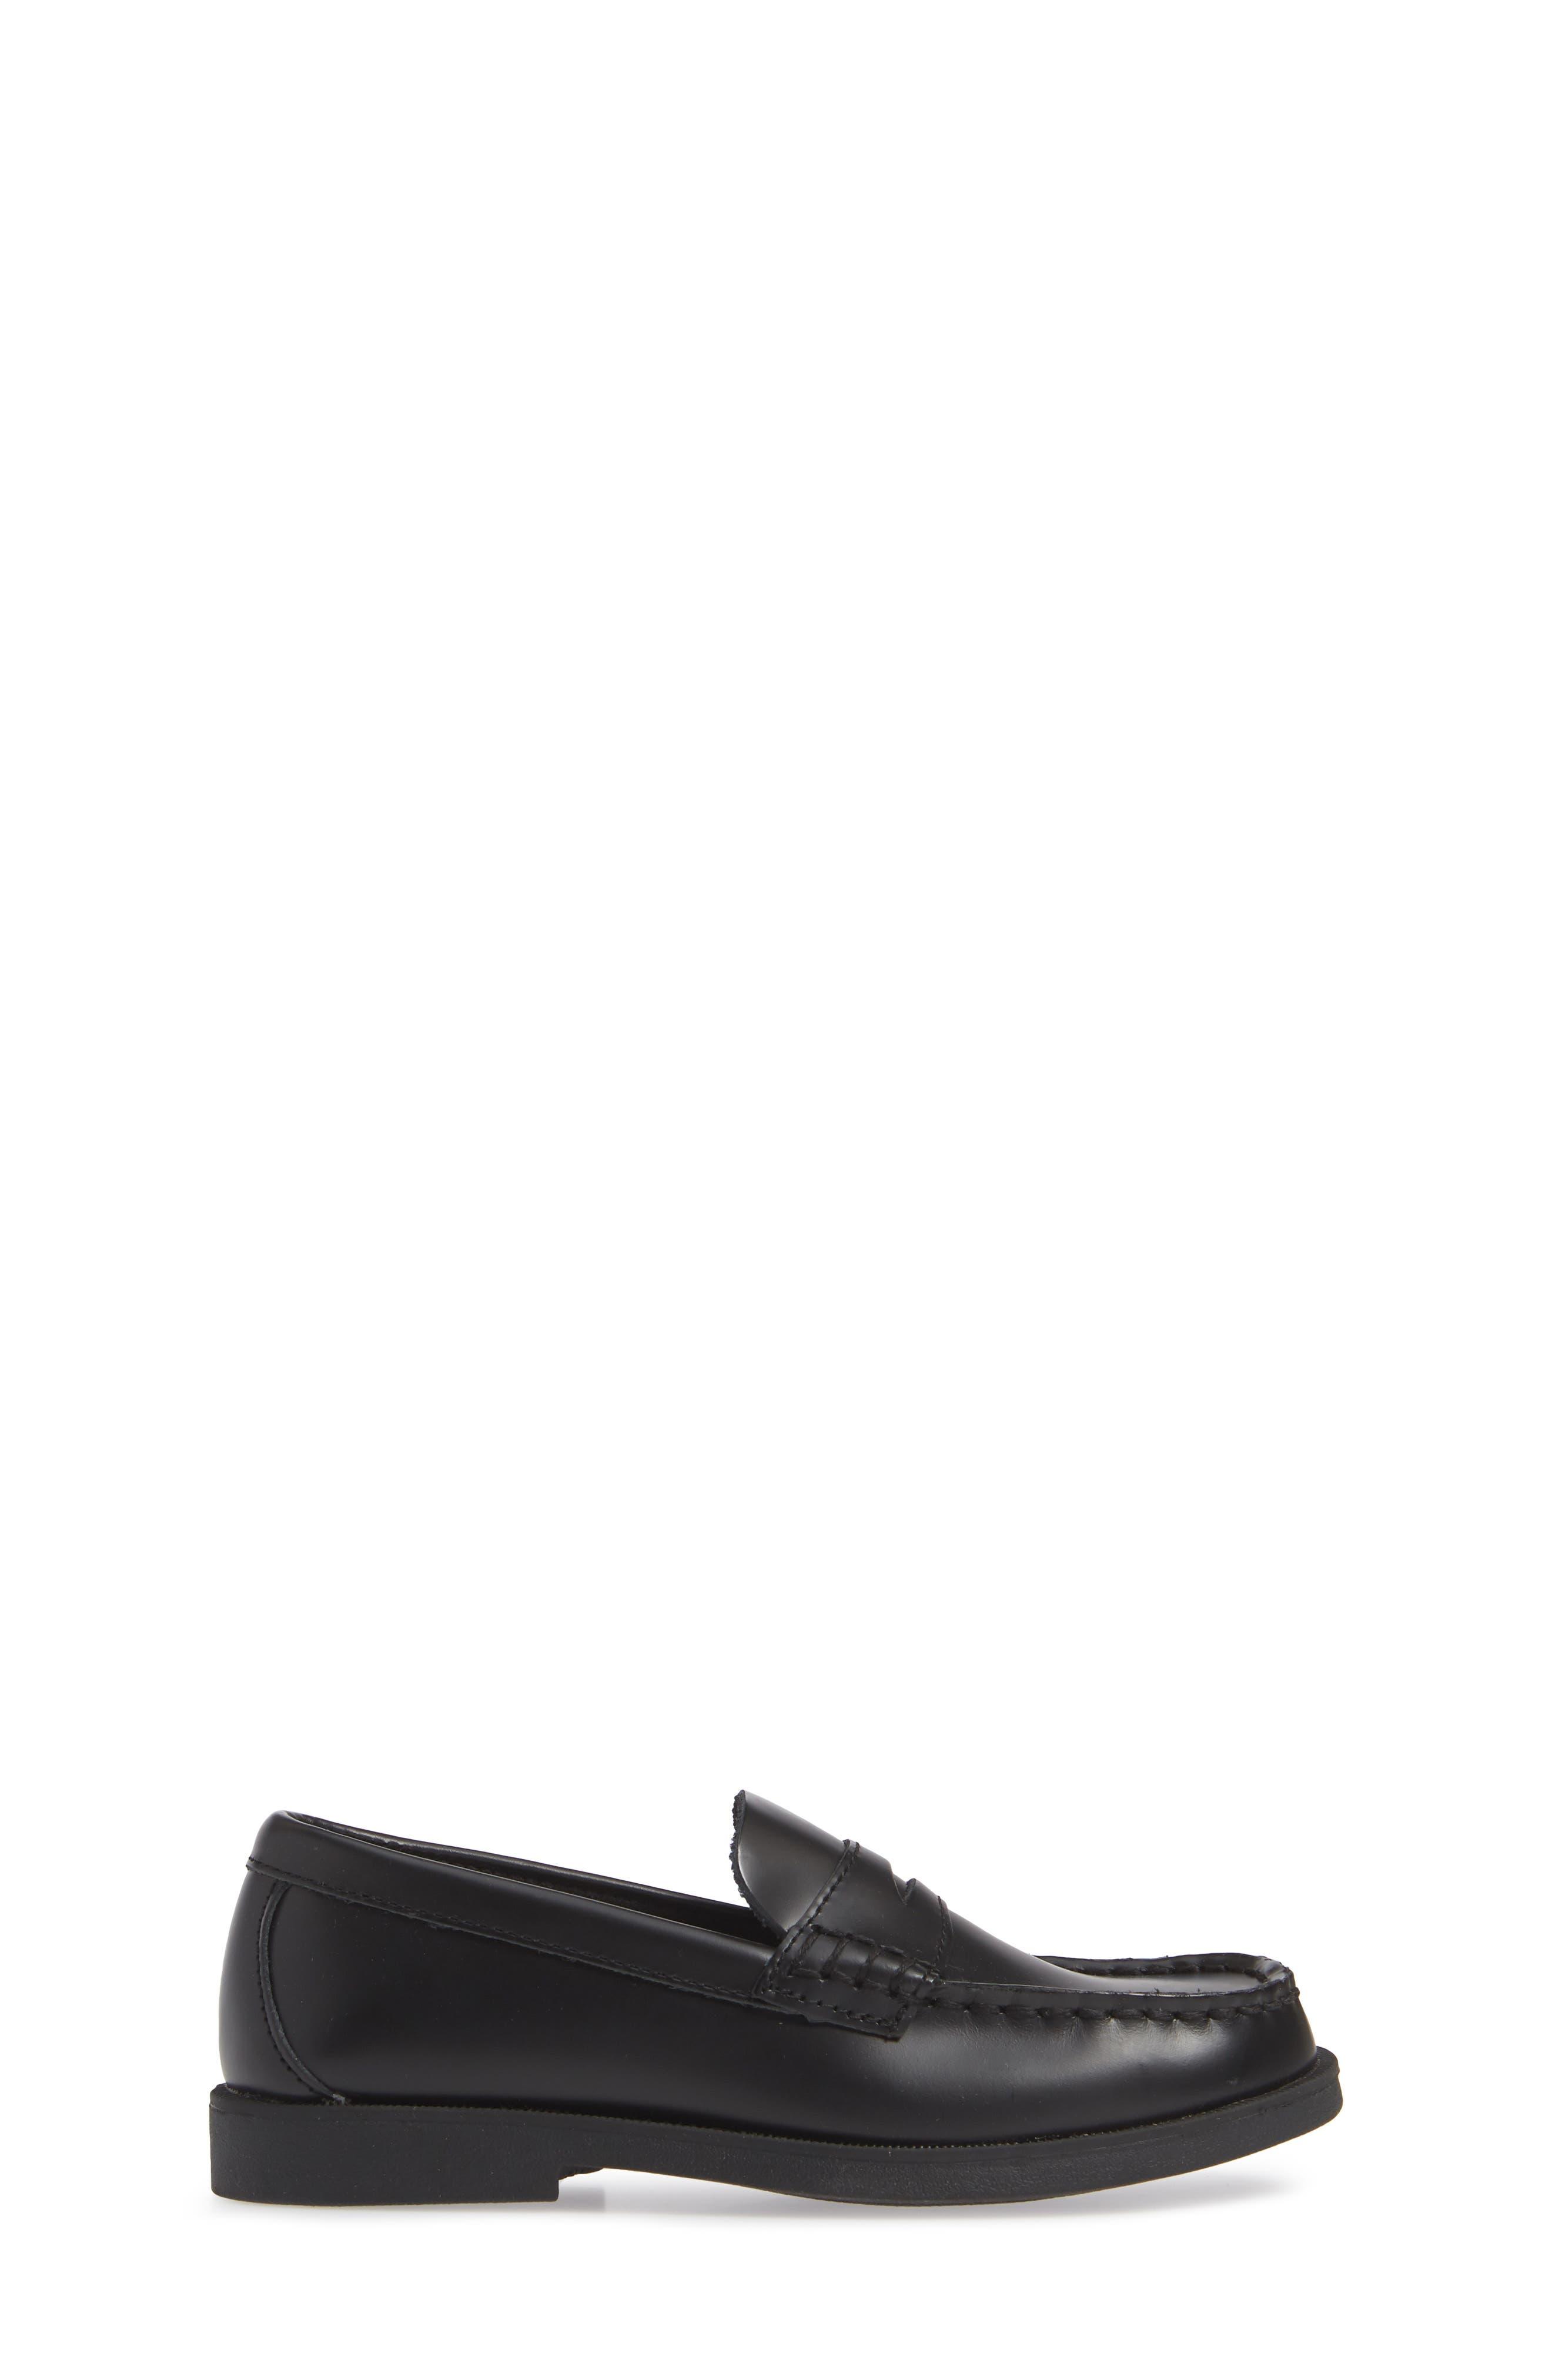 SPERRY KIDS, 'Colton' Loafer, Alternate thumbnail 4, color, BLACK LEATHER